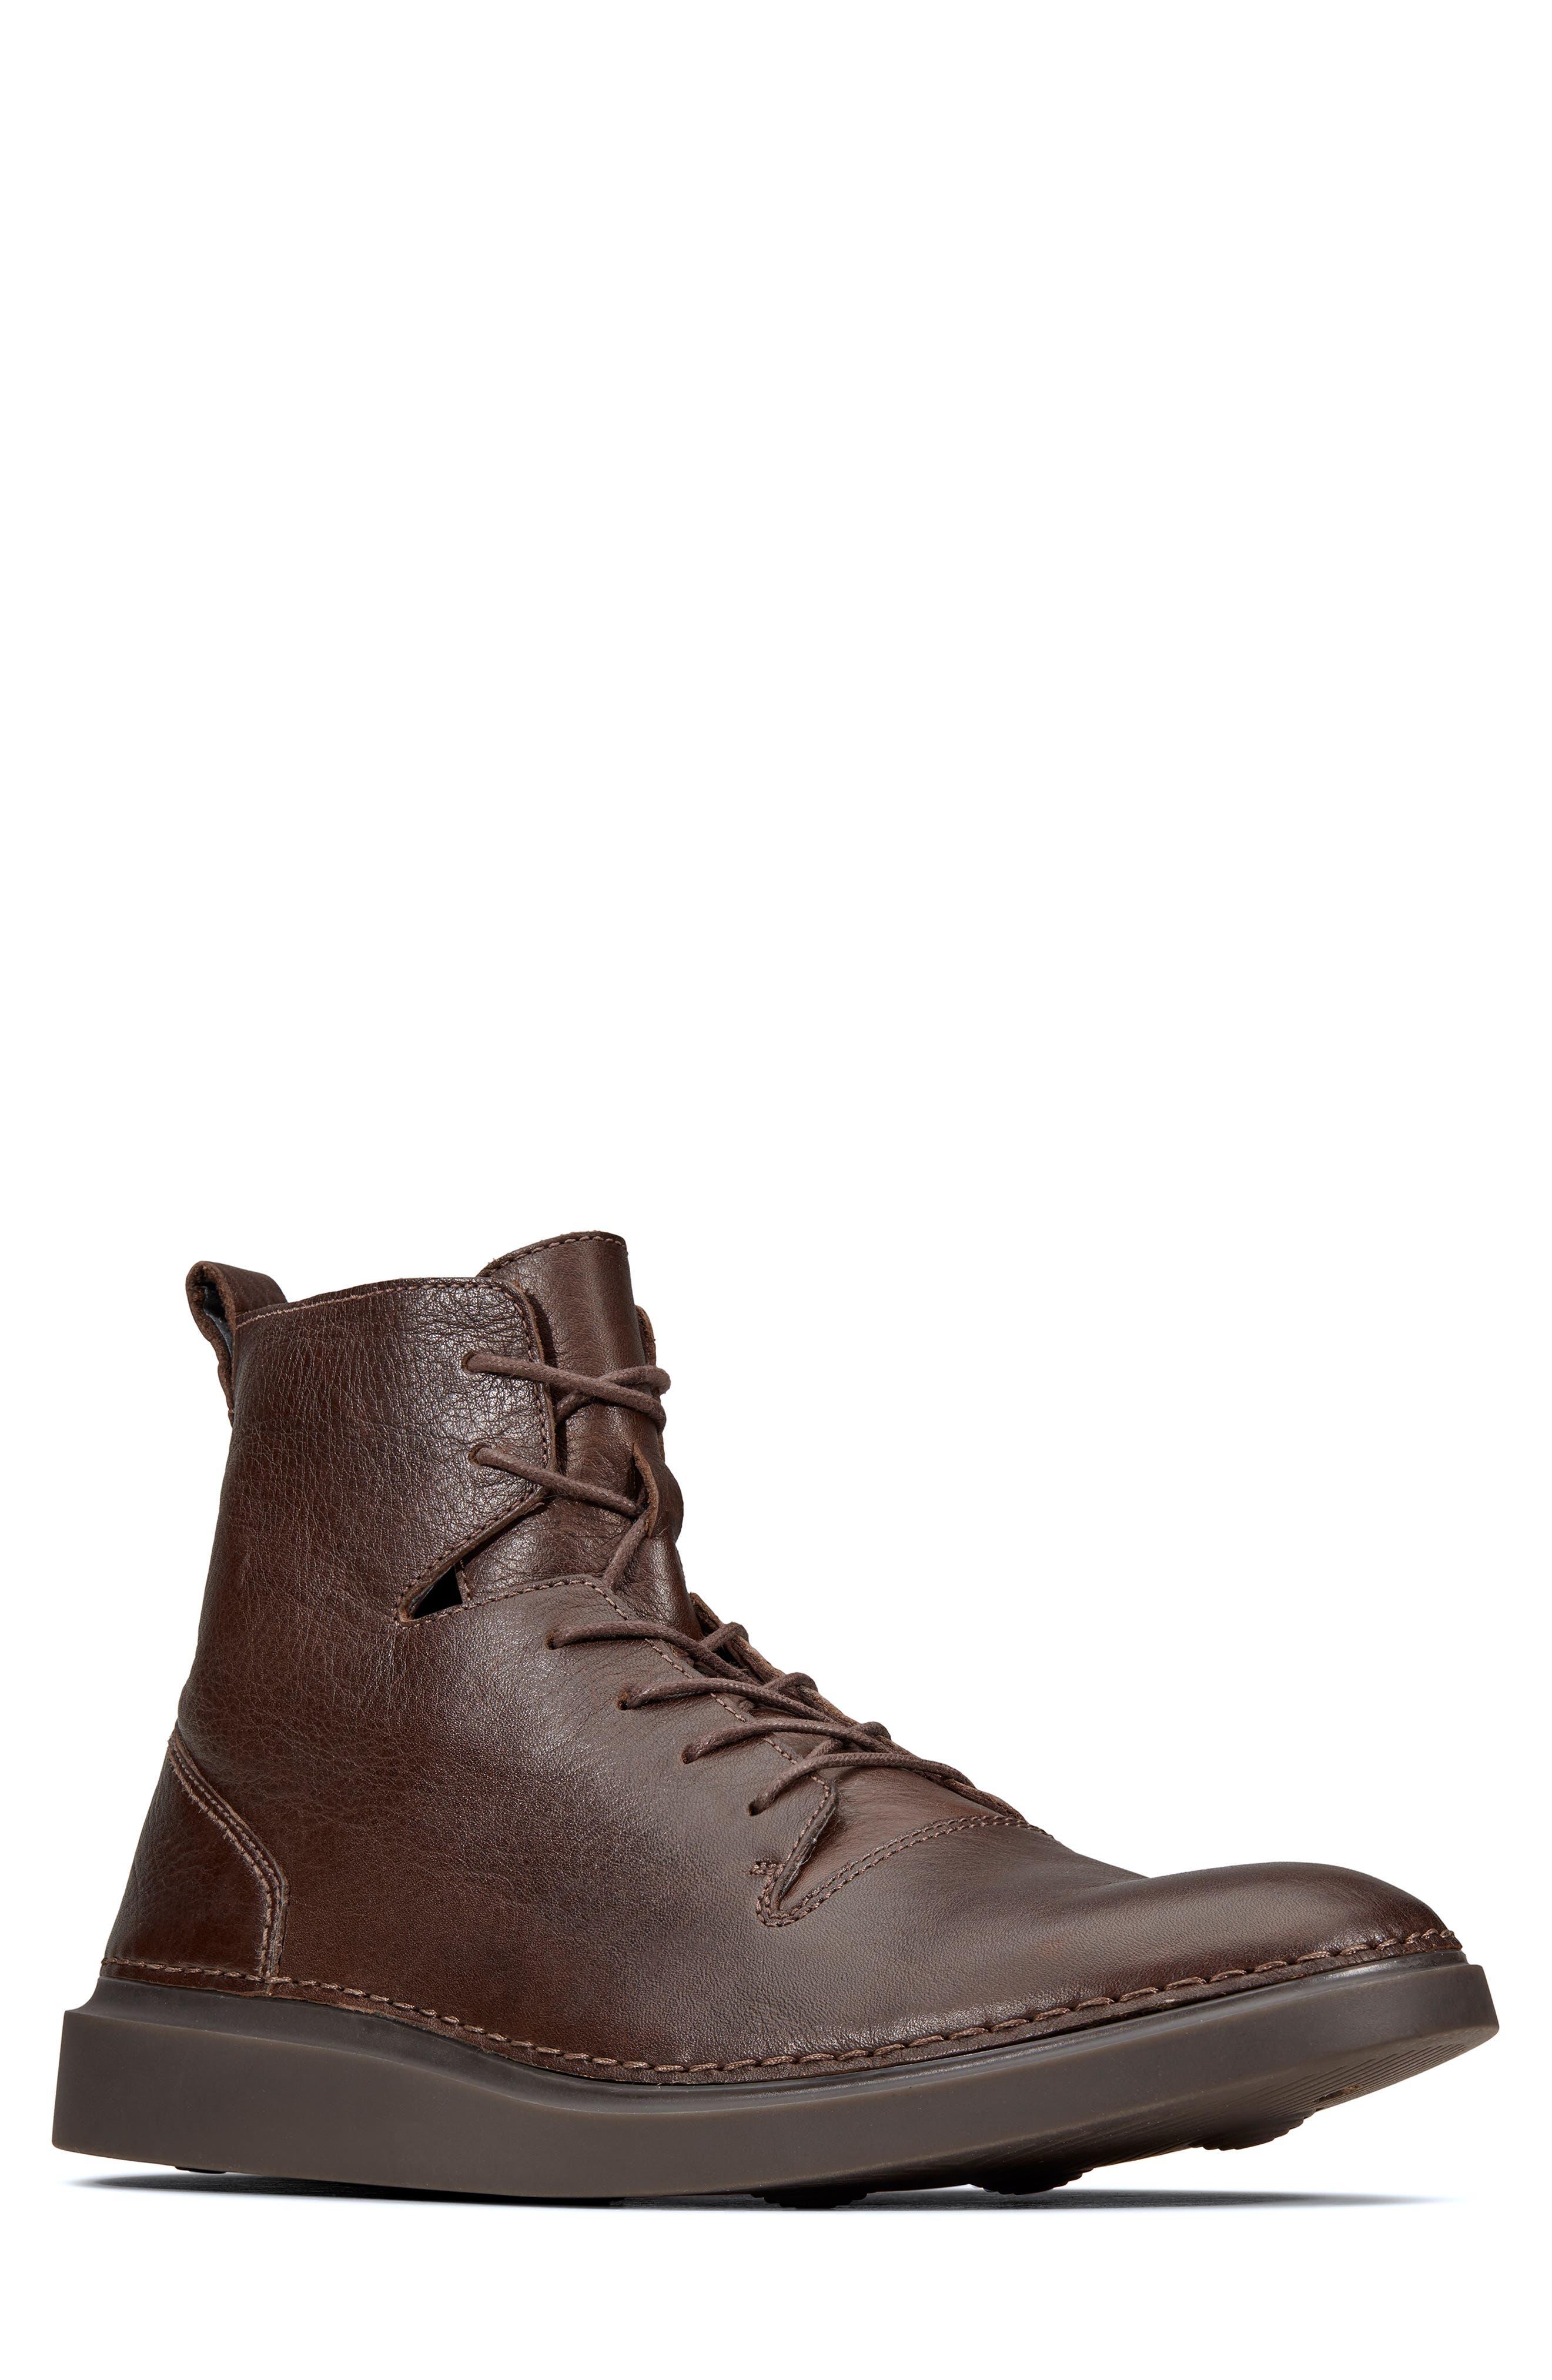 Hale Rise Plain Toe Boot,                             Main thumbnail 1, color,                             213